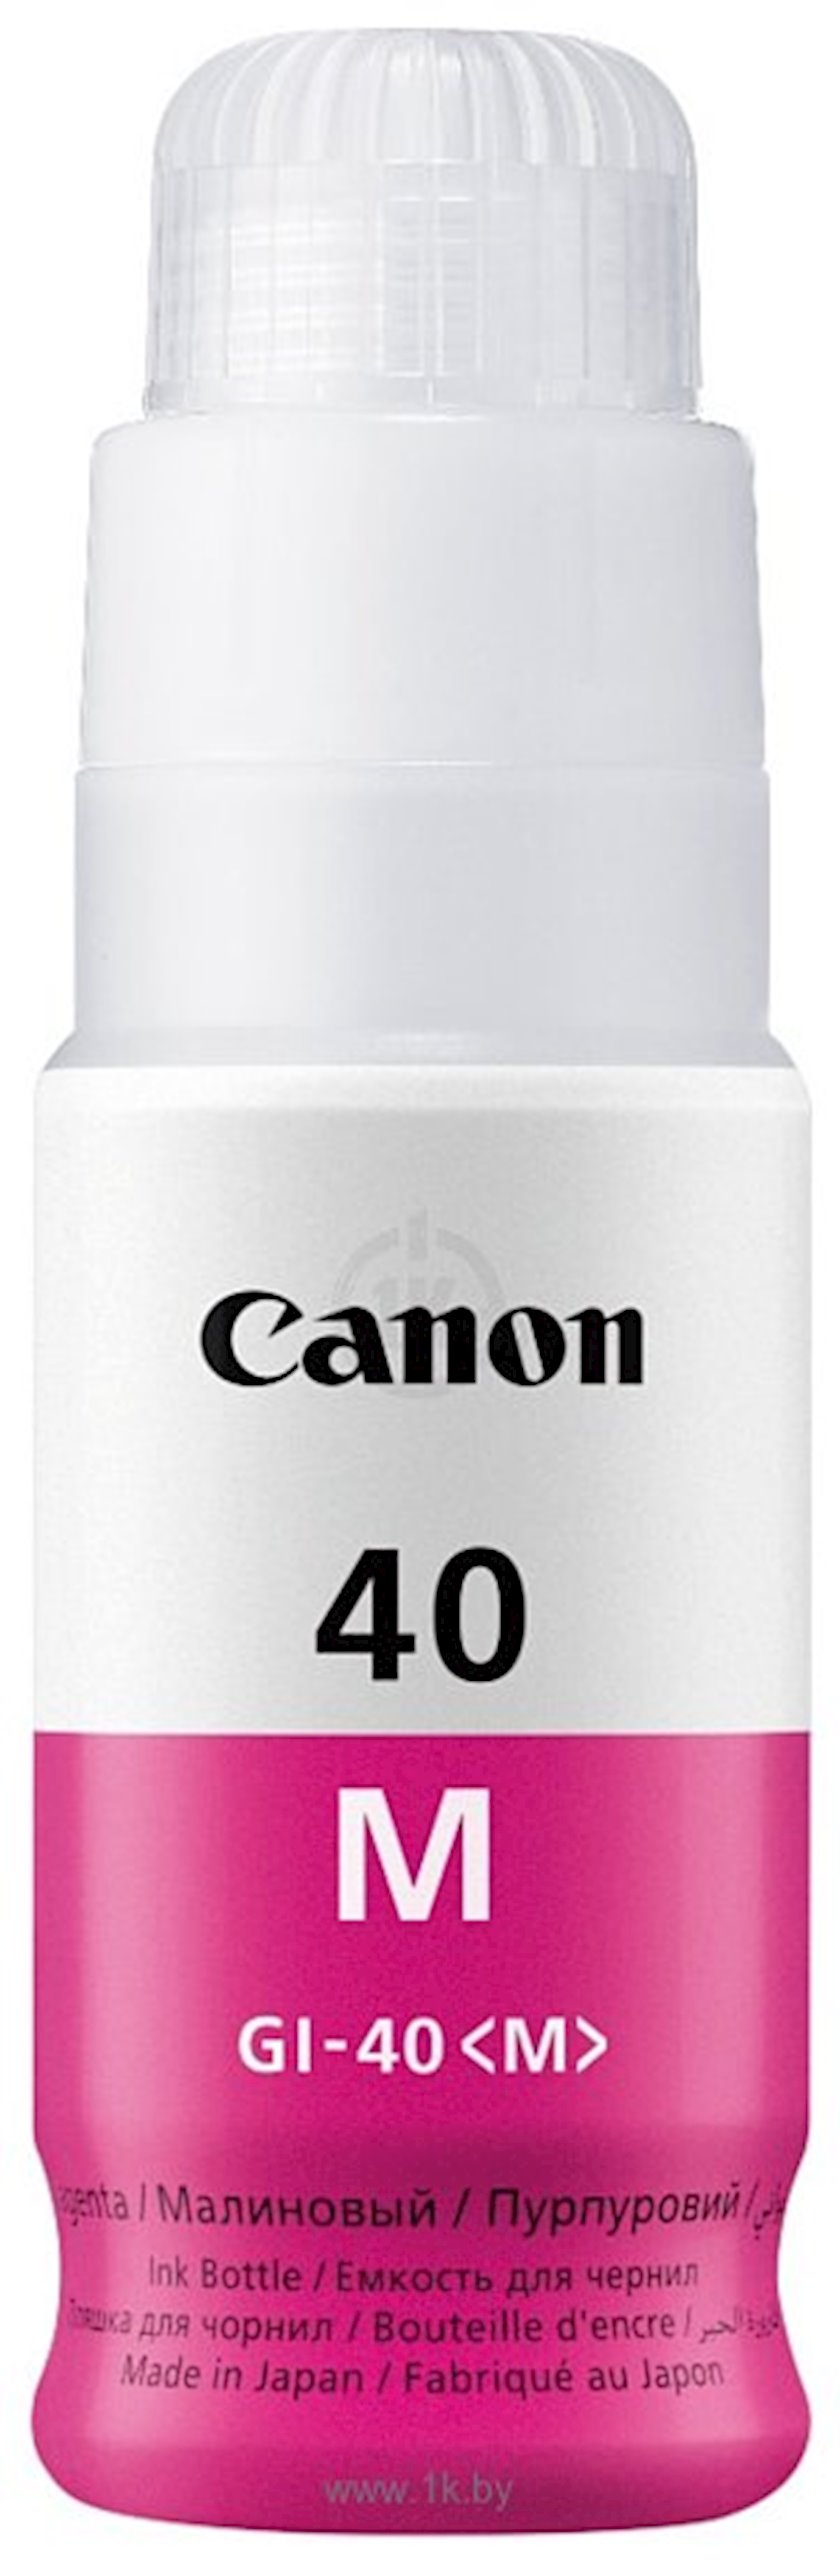 Toner-kartric Canon INK GI-40 M